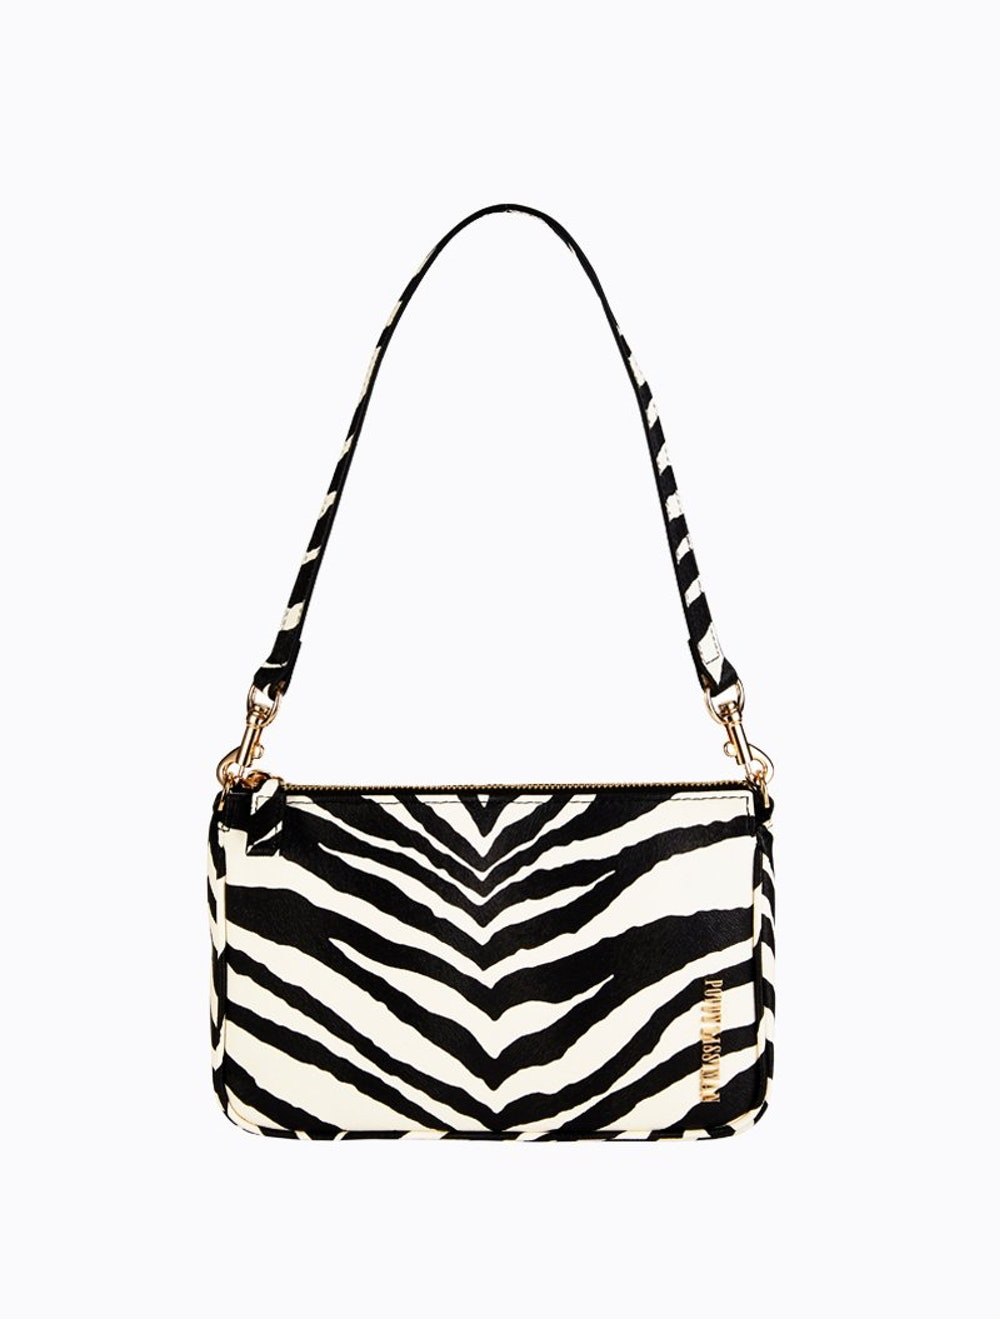 Poison Pouchette Bag in Zebra